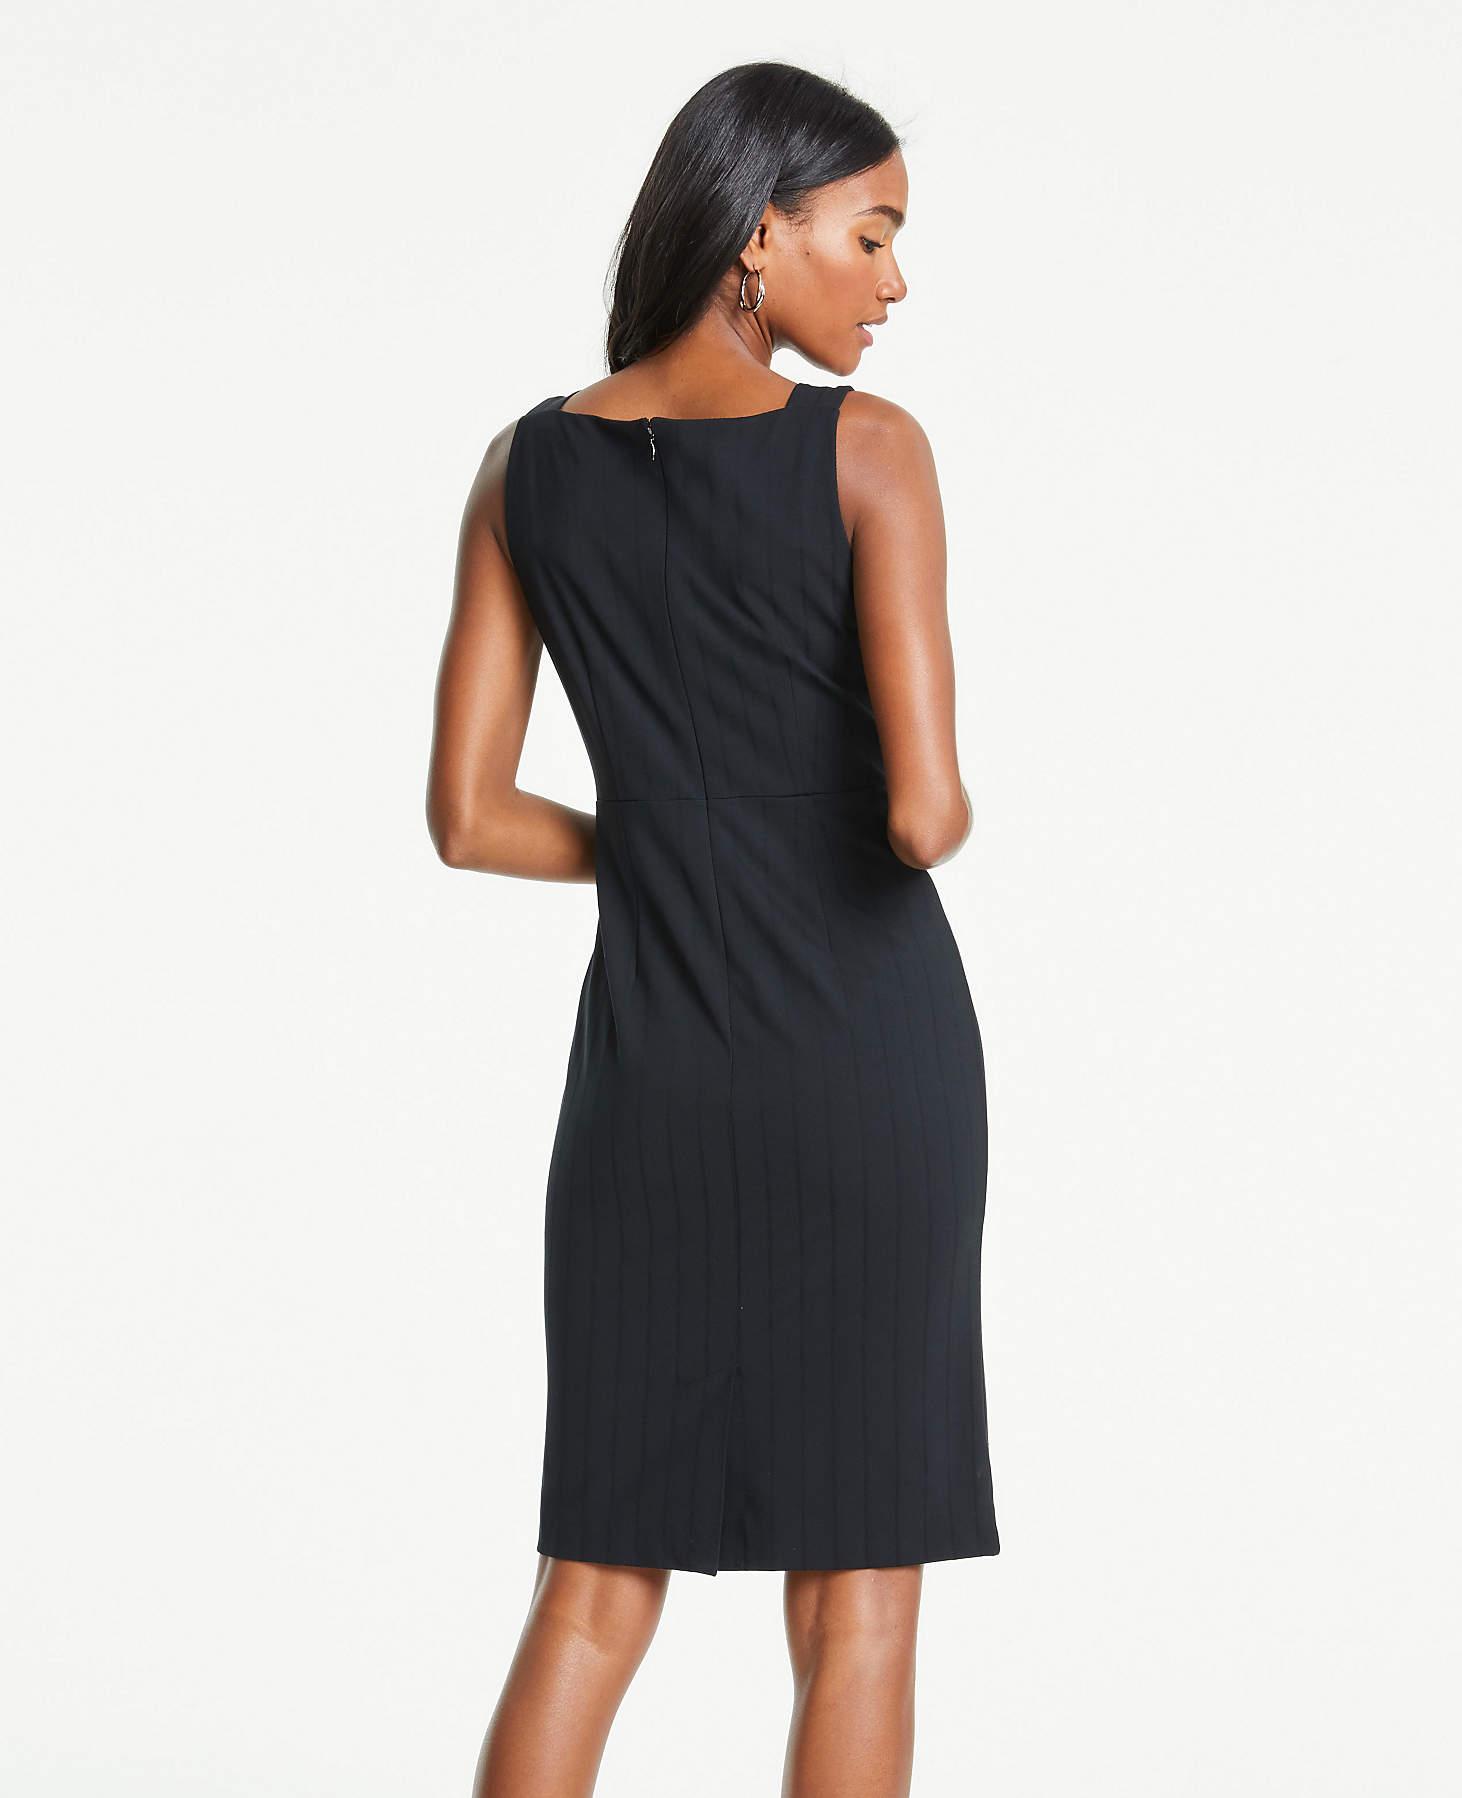 65fc9668d6b Lyst - Ann Taylor Striped Square Neck Sheath Dress in Black